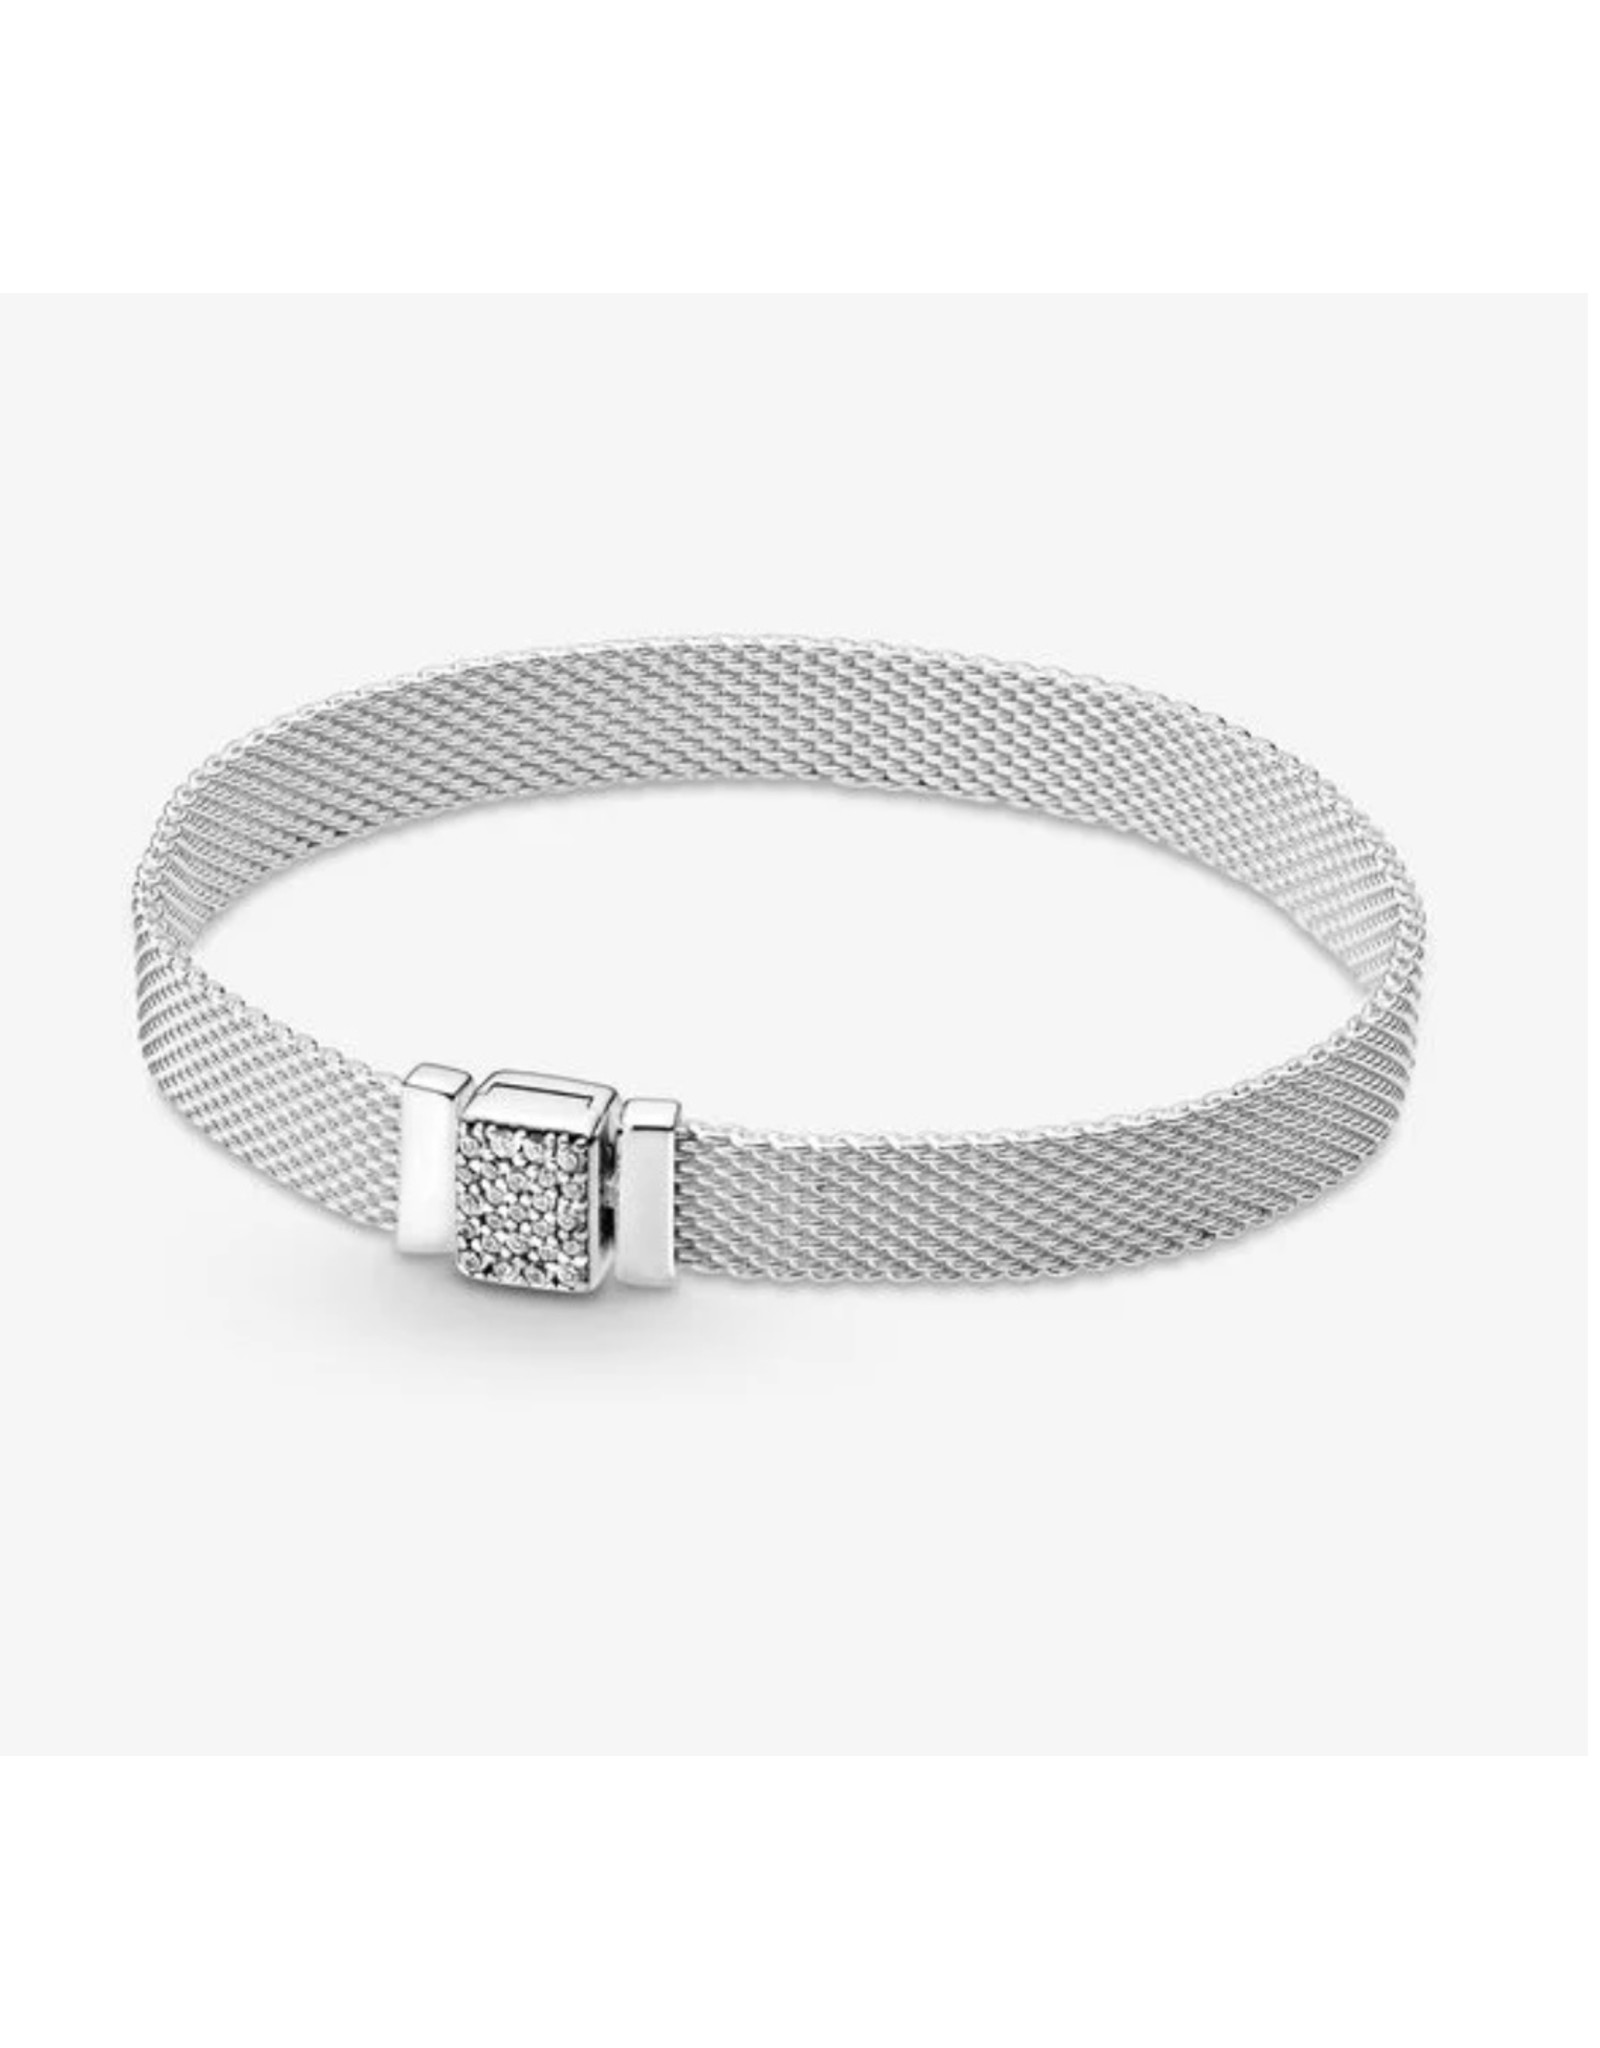 Pandora Pandora Bracelet,599166C01, Reflexions Sparkling Clasp